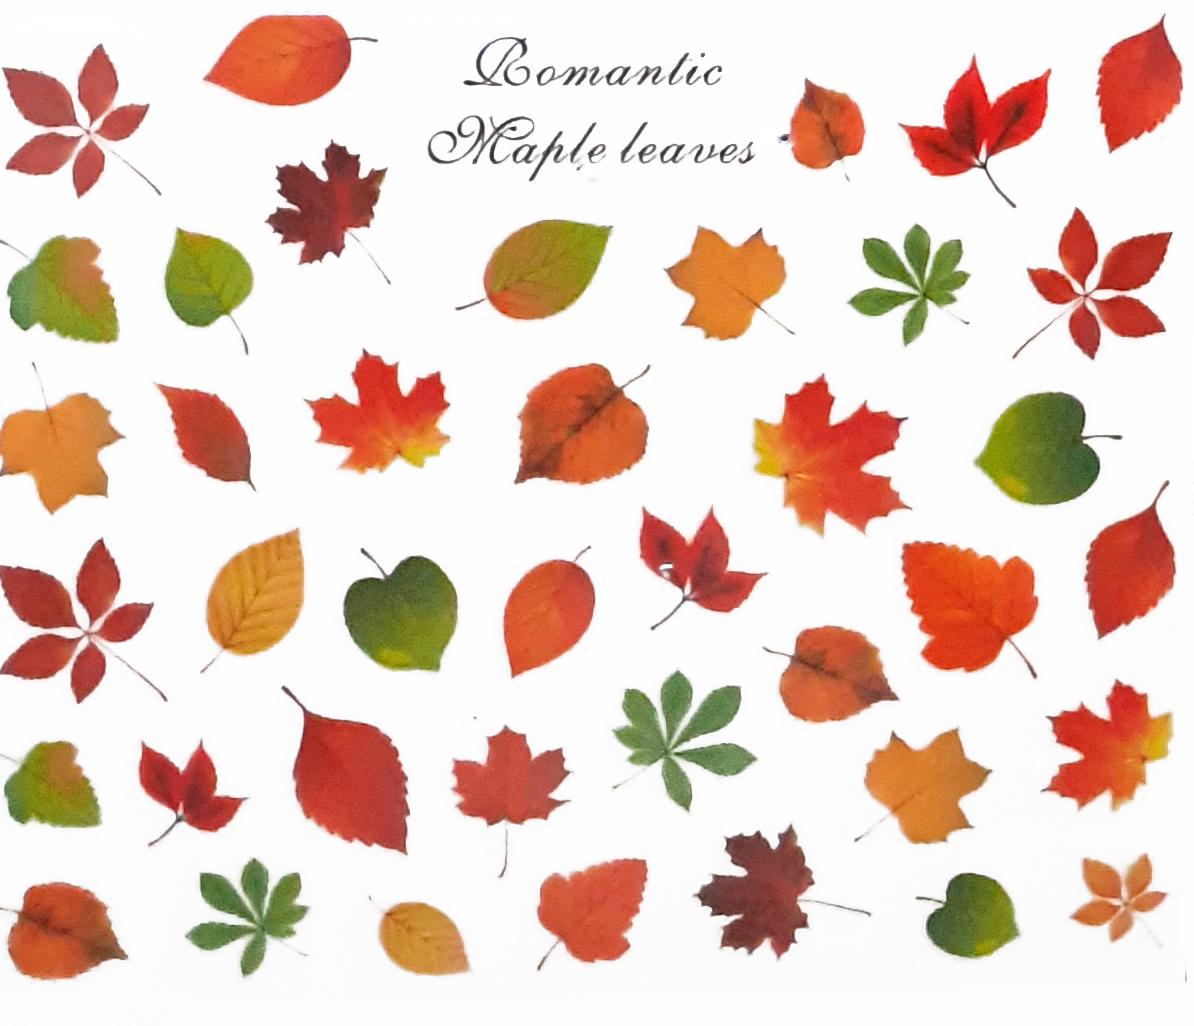 Sticker Herbstblätter Romantic farbig